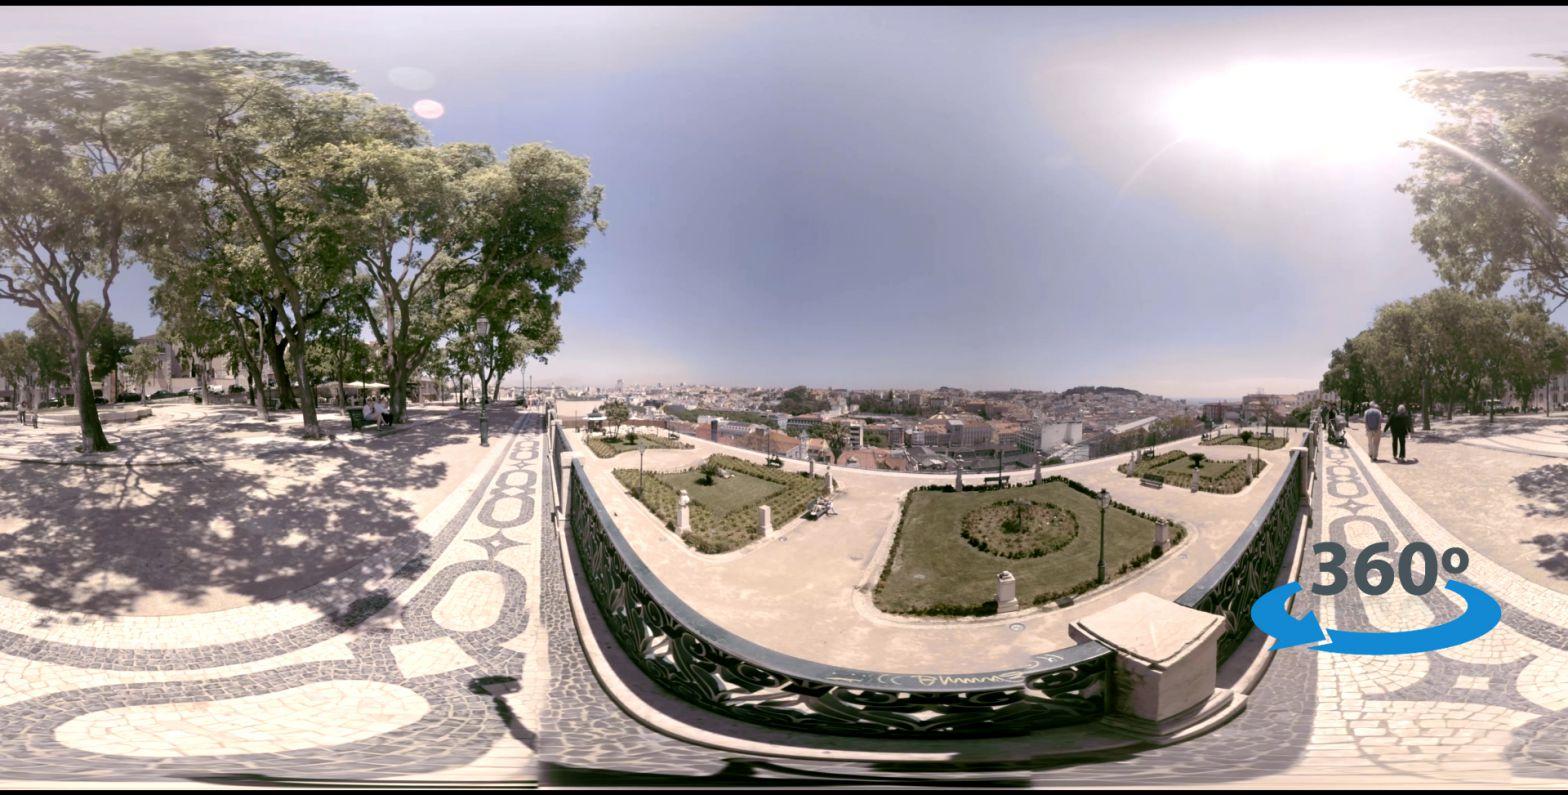 360º_Virtual Reality_ShowReel 2015_CornerStudio_VR_Gopro_Portugal_Lisbon